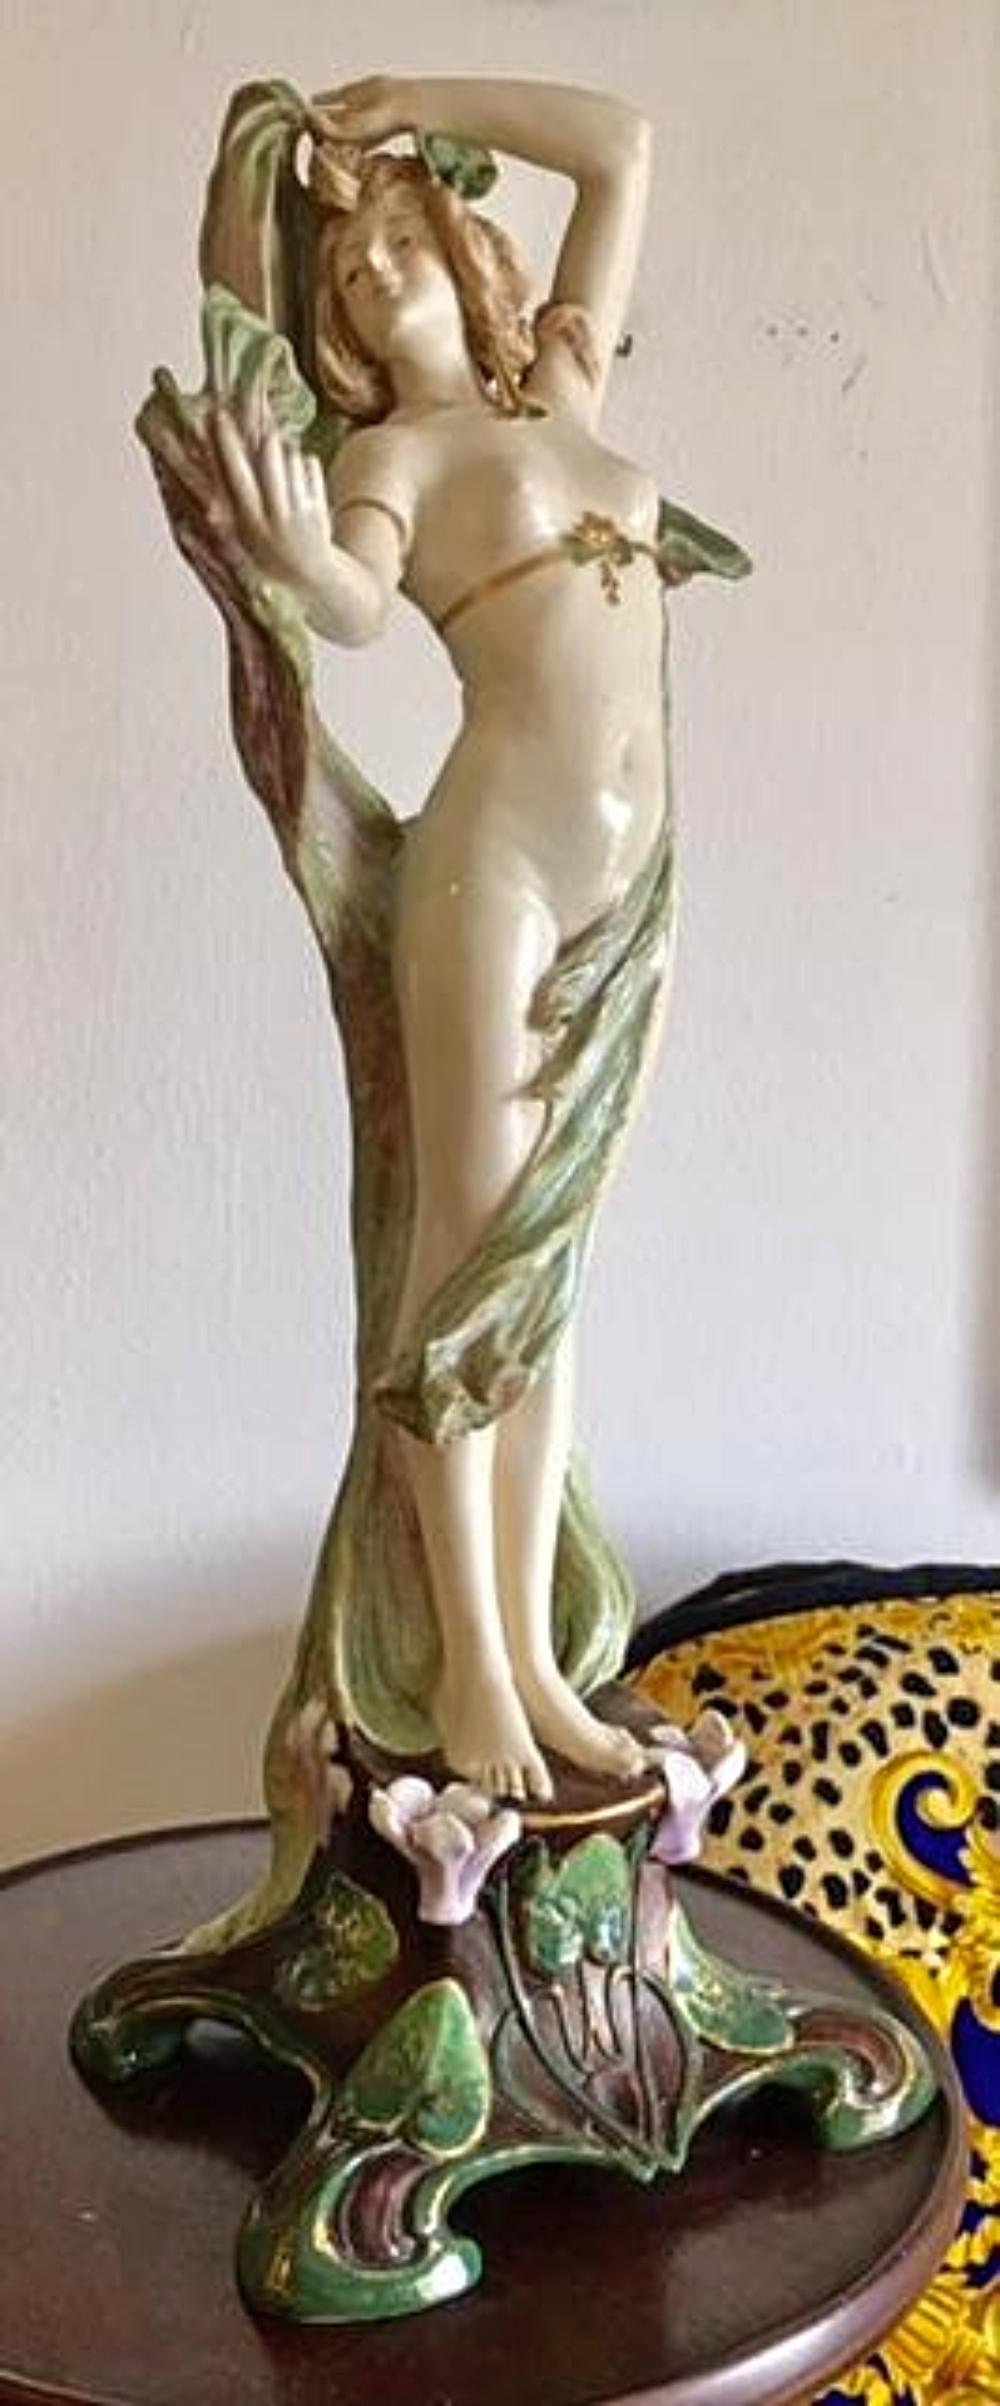 Lot 12: RIESSNER, STELLMACHER & KESSEL Amphora Depose Turn Wien Teplitz Nude Figure Statue